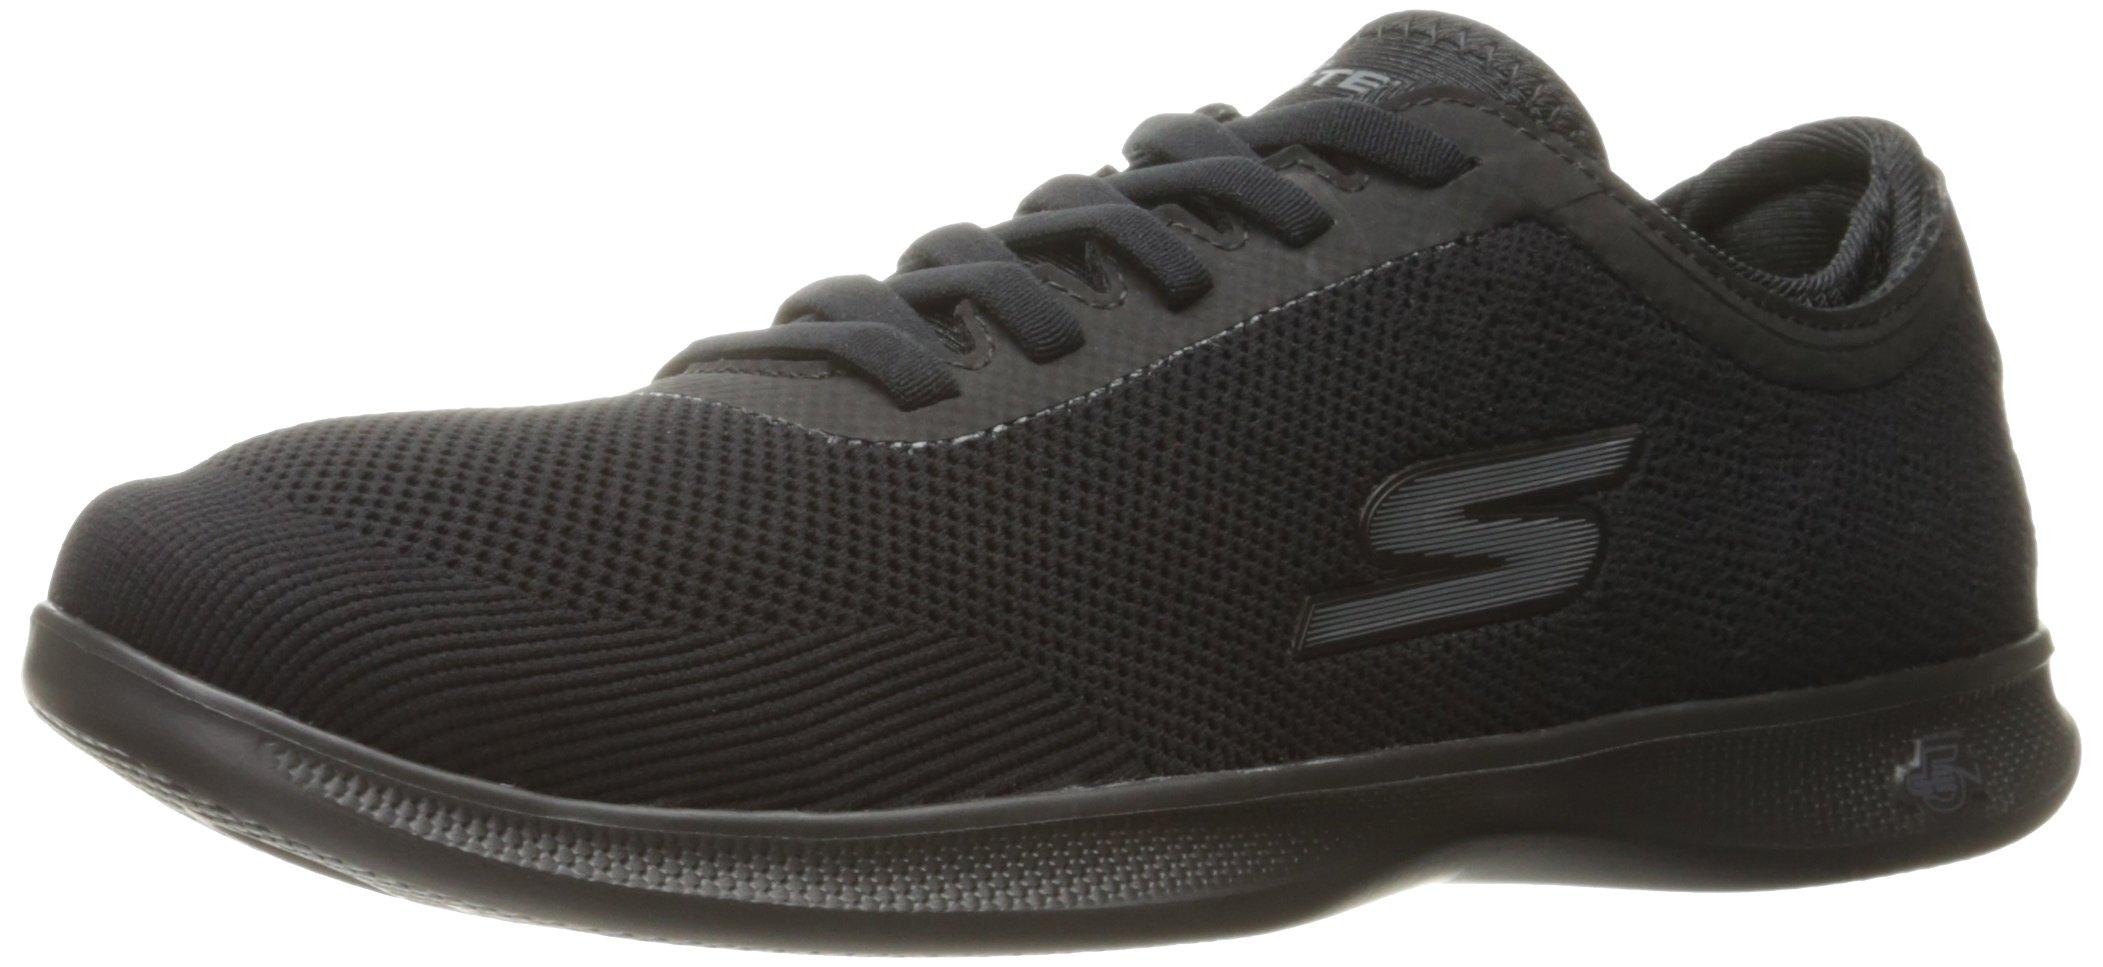 Skechers Performance Women's Go Step Lite-Swerve Walking Shoe,Black,9.5 M US